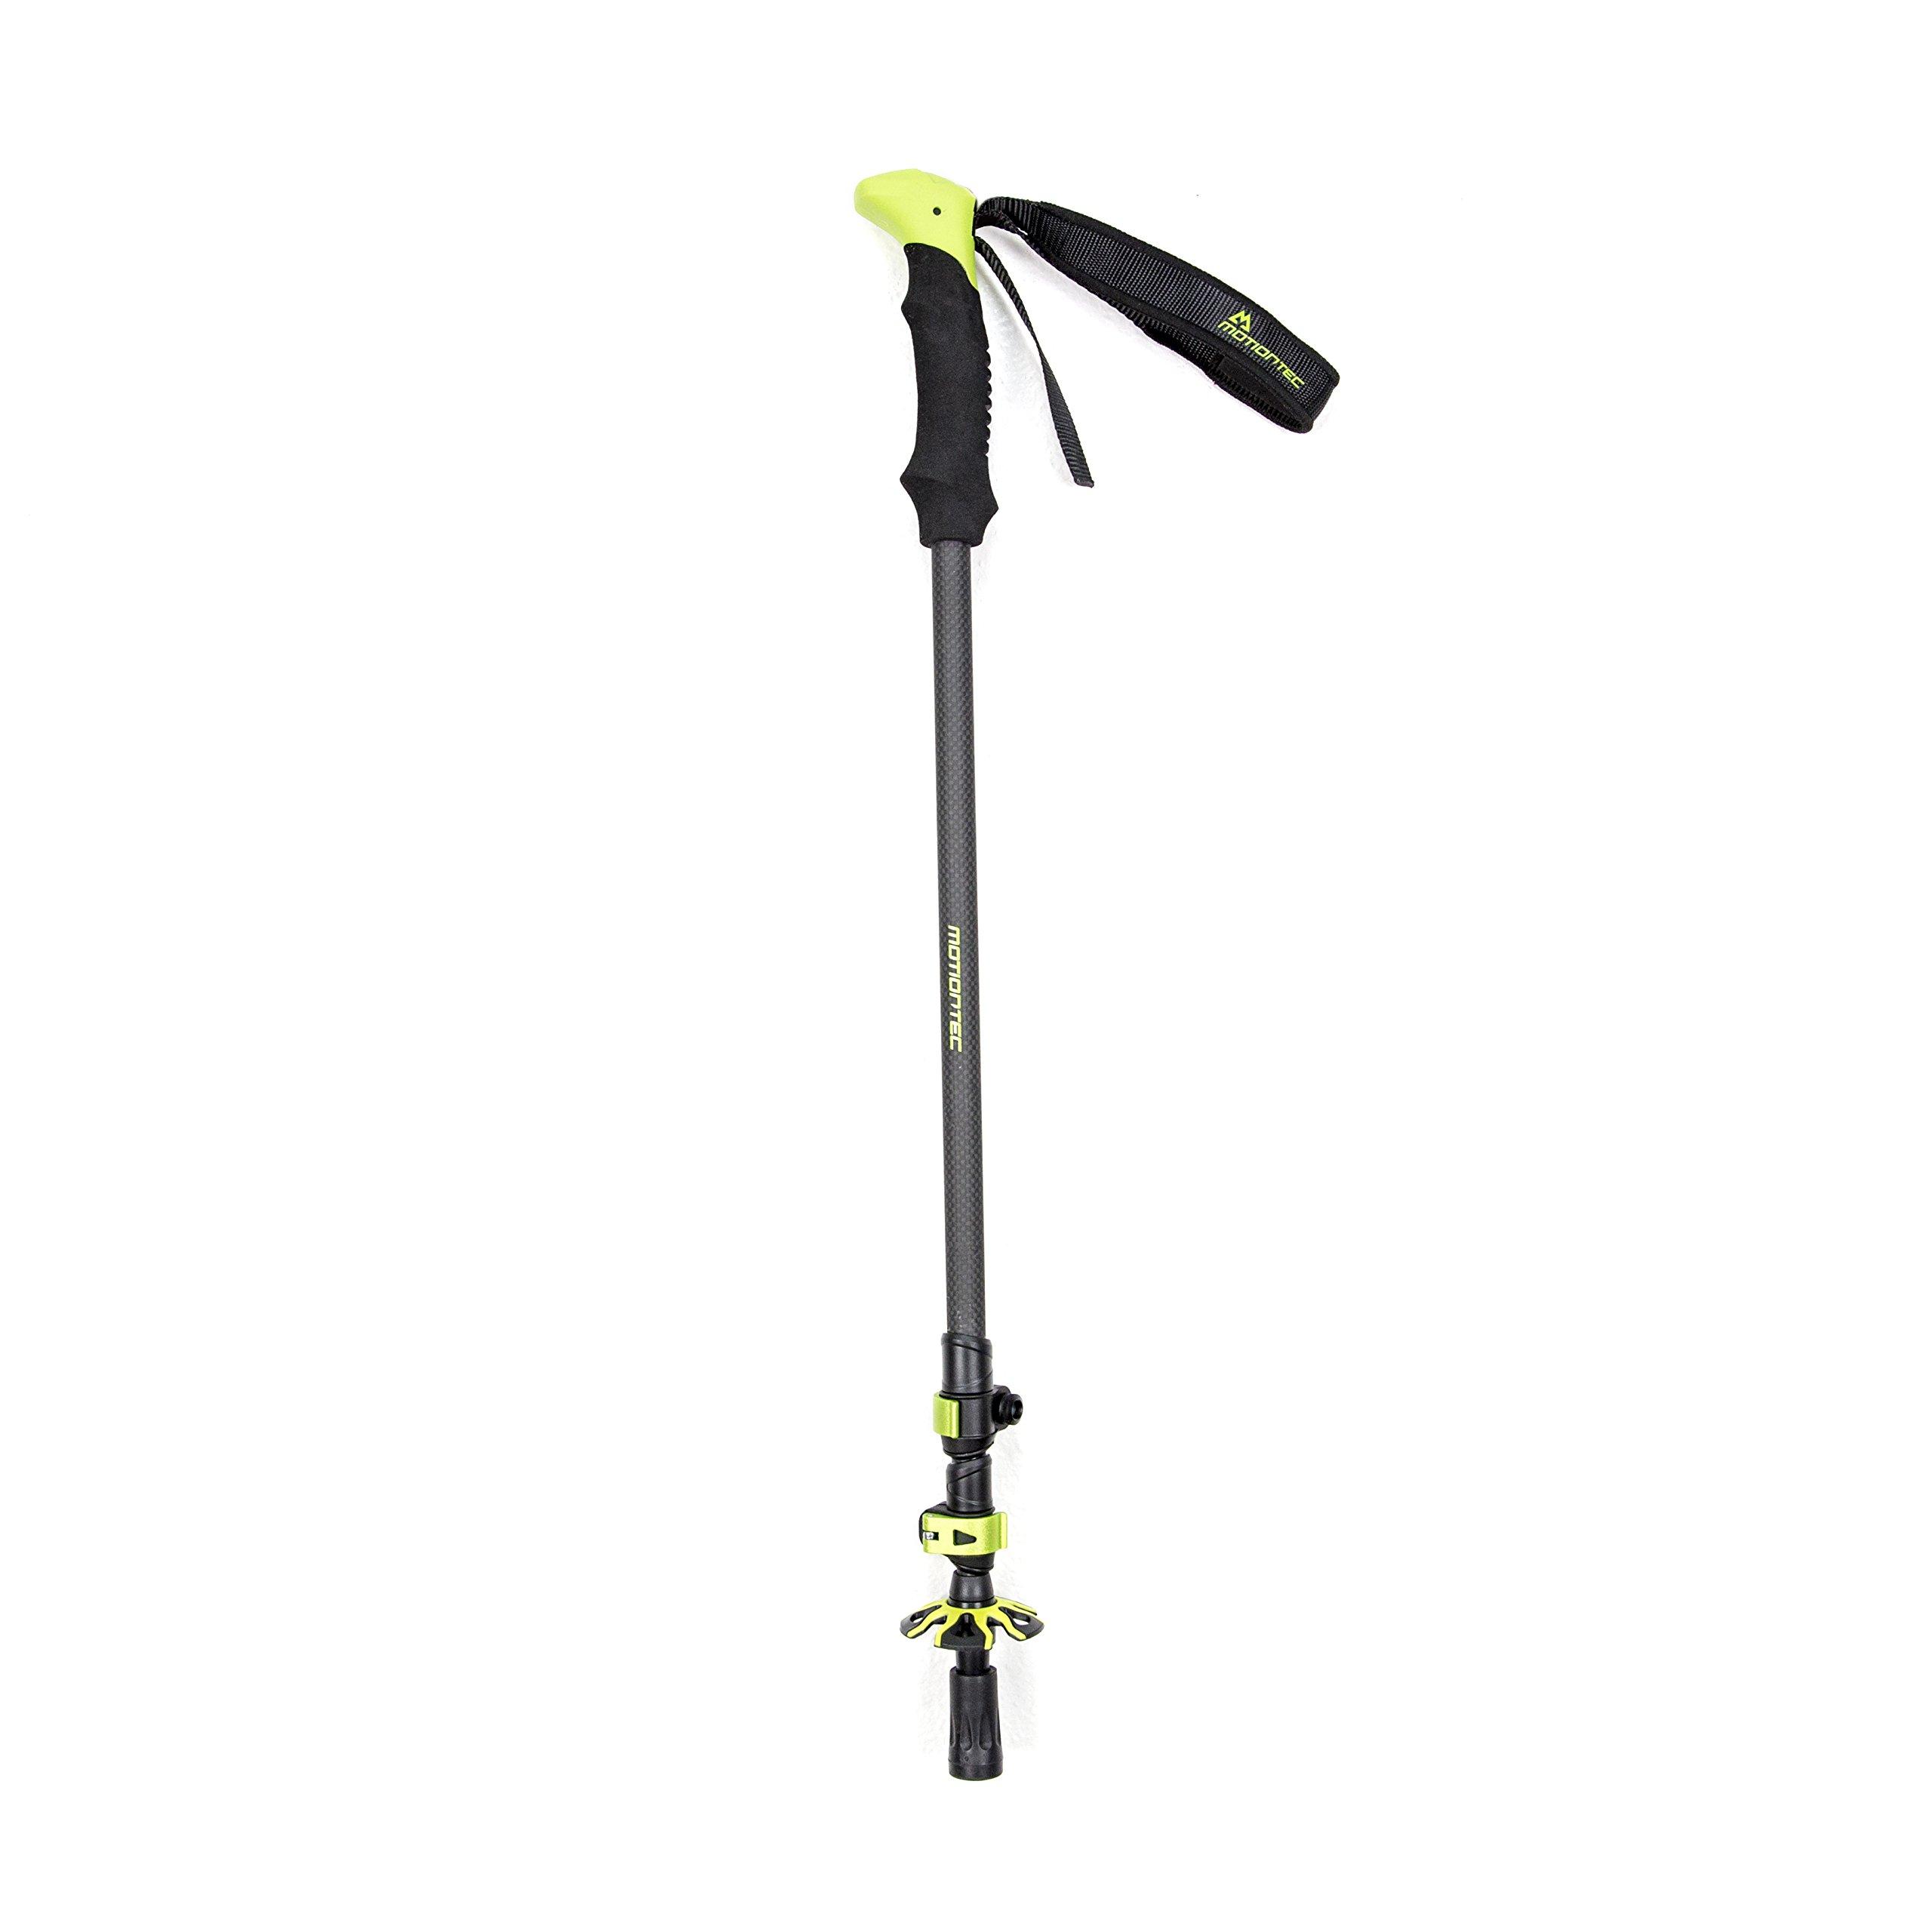 Motiontec Carbon Fiber Trekking Poles, Graphite/Lime, One Size by Motiontec